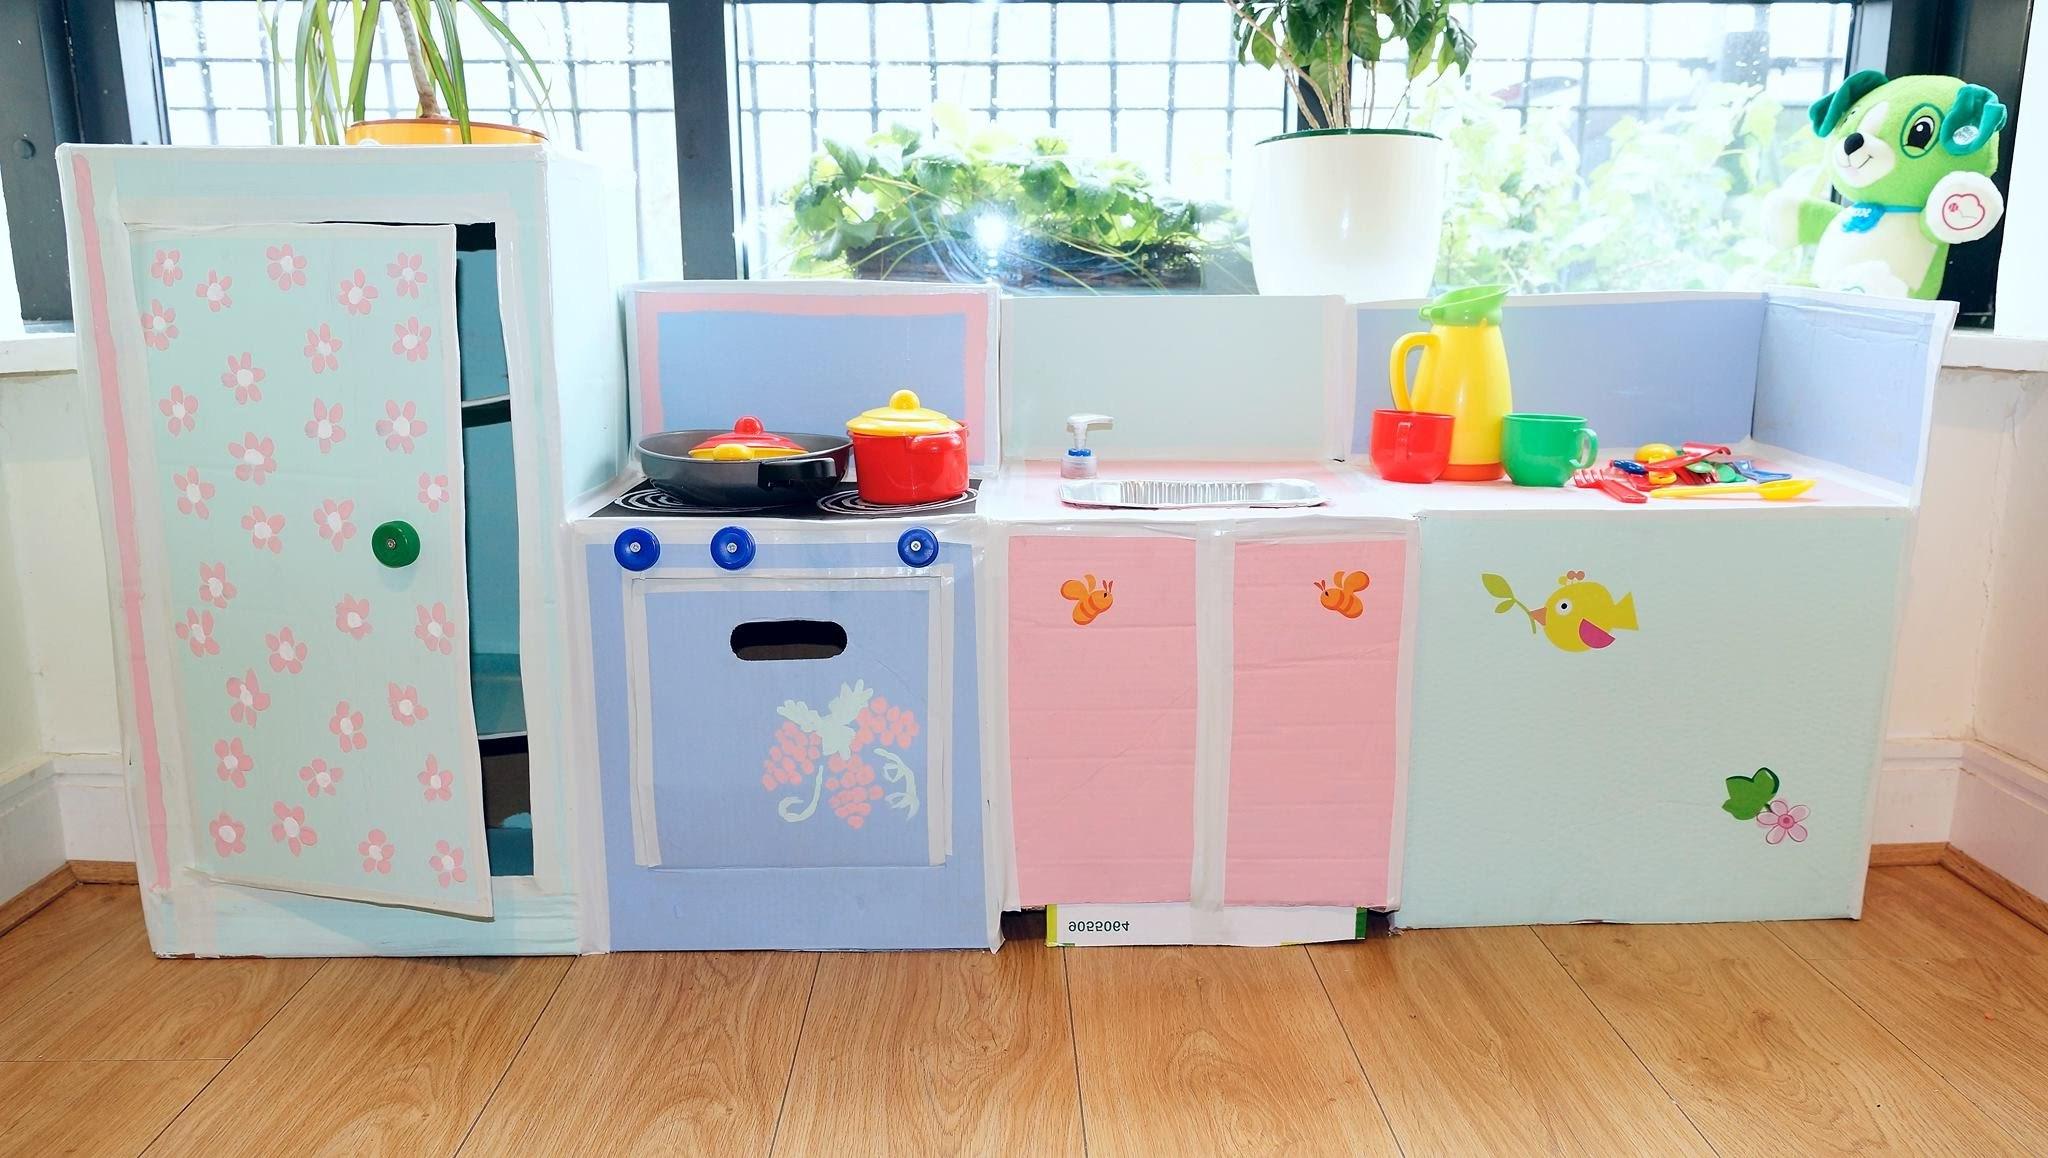 Outdoor Küche Kinder Bauen : Kinder outdoor küche selber bauen ideen küche outdoor küche